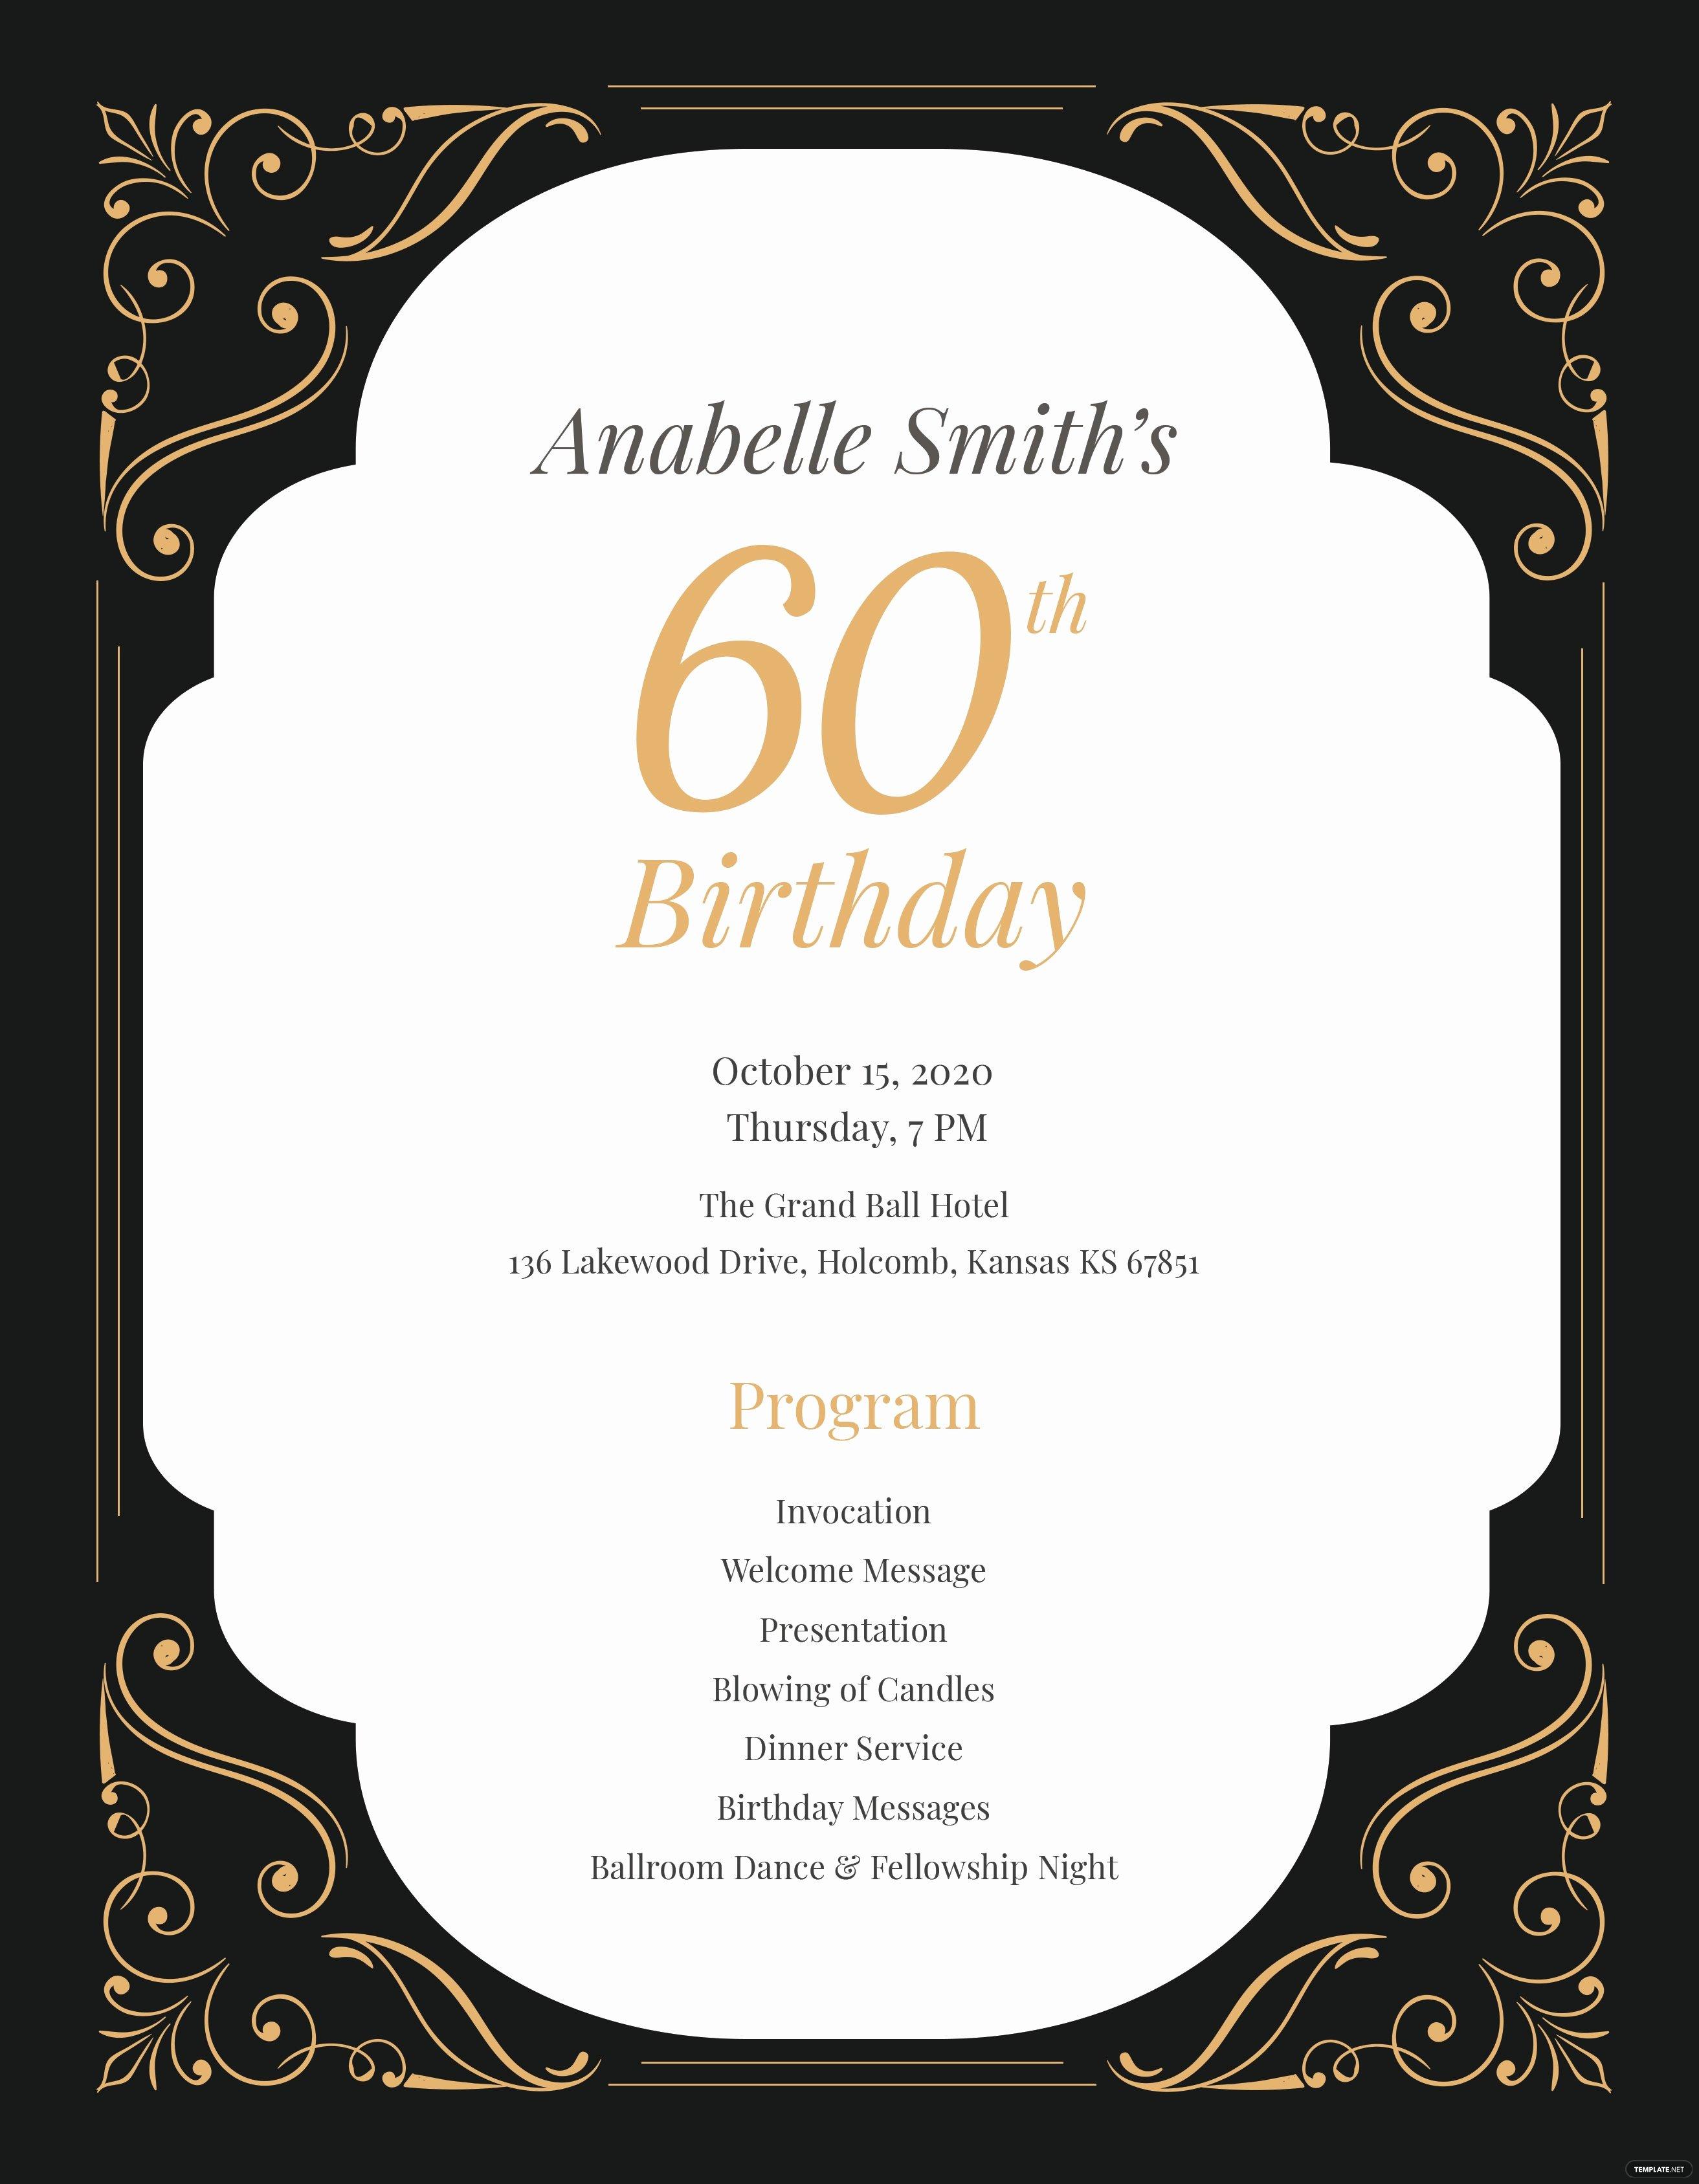 Birthday Party Program Template Luxury 60th Birthday Program Template In Adobe Shop Illustrator